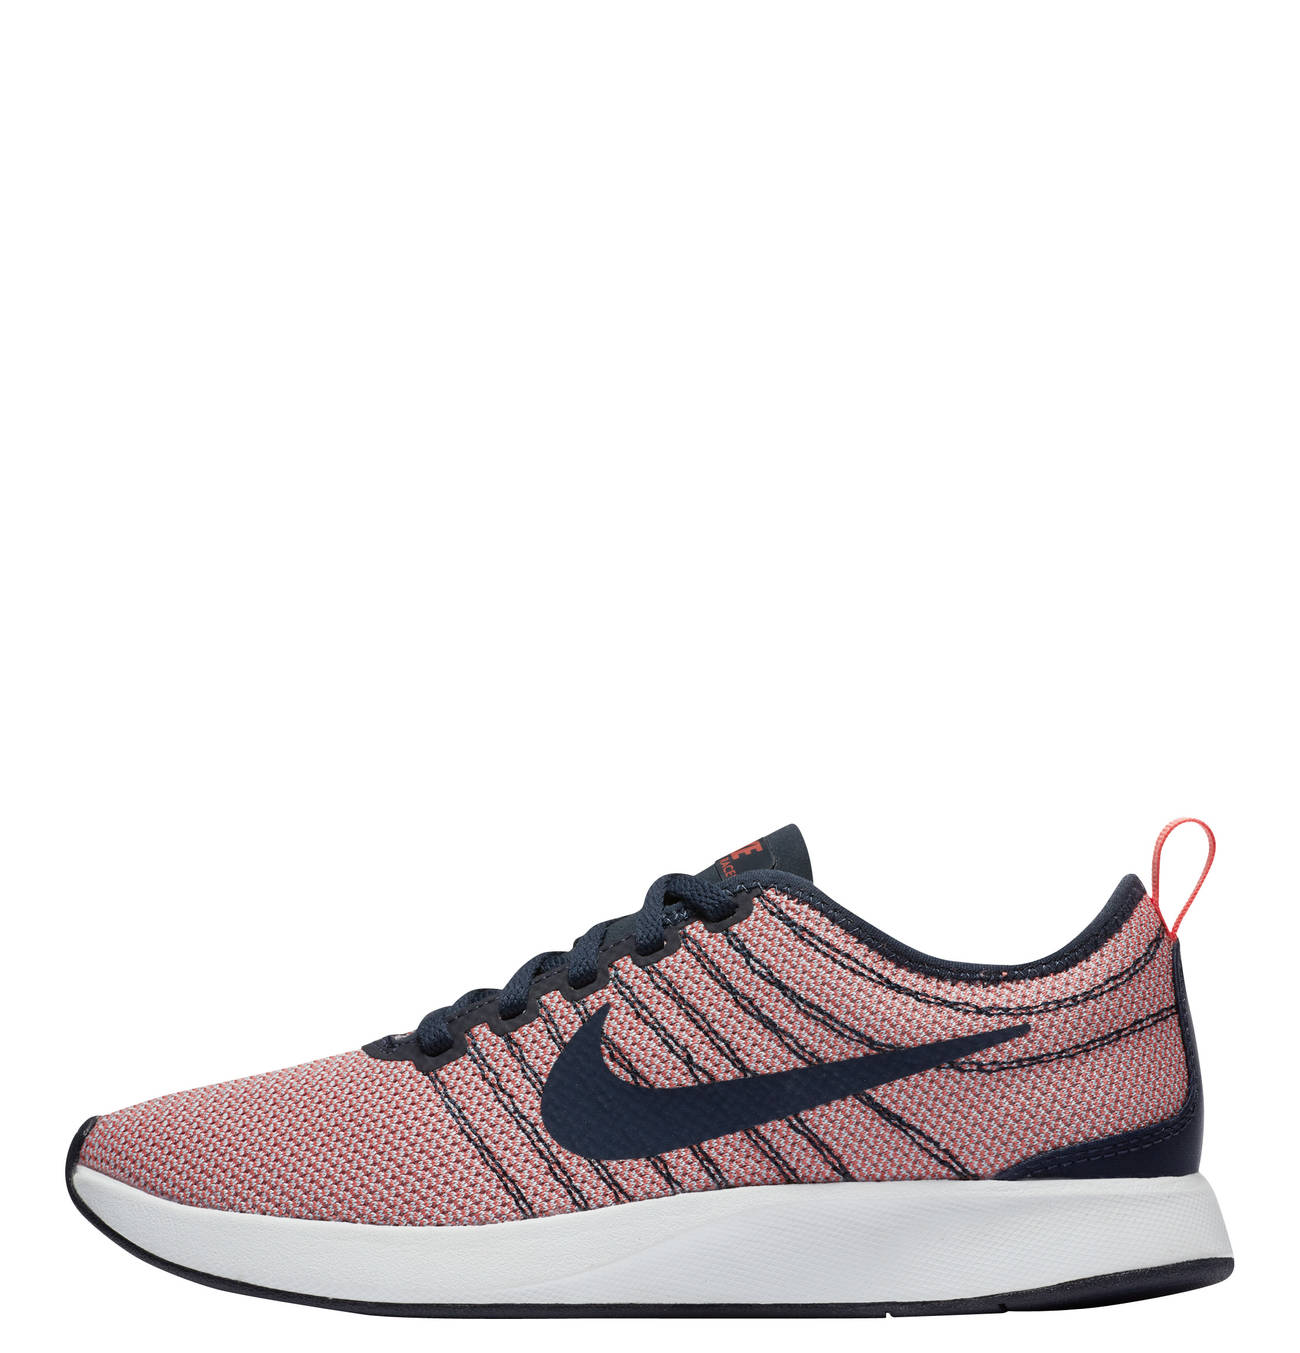 Sneaker Dualtone Racer Knit Optik Logo Emblem Mit Bildern Sneaker Nike Zweifarbig